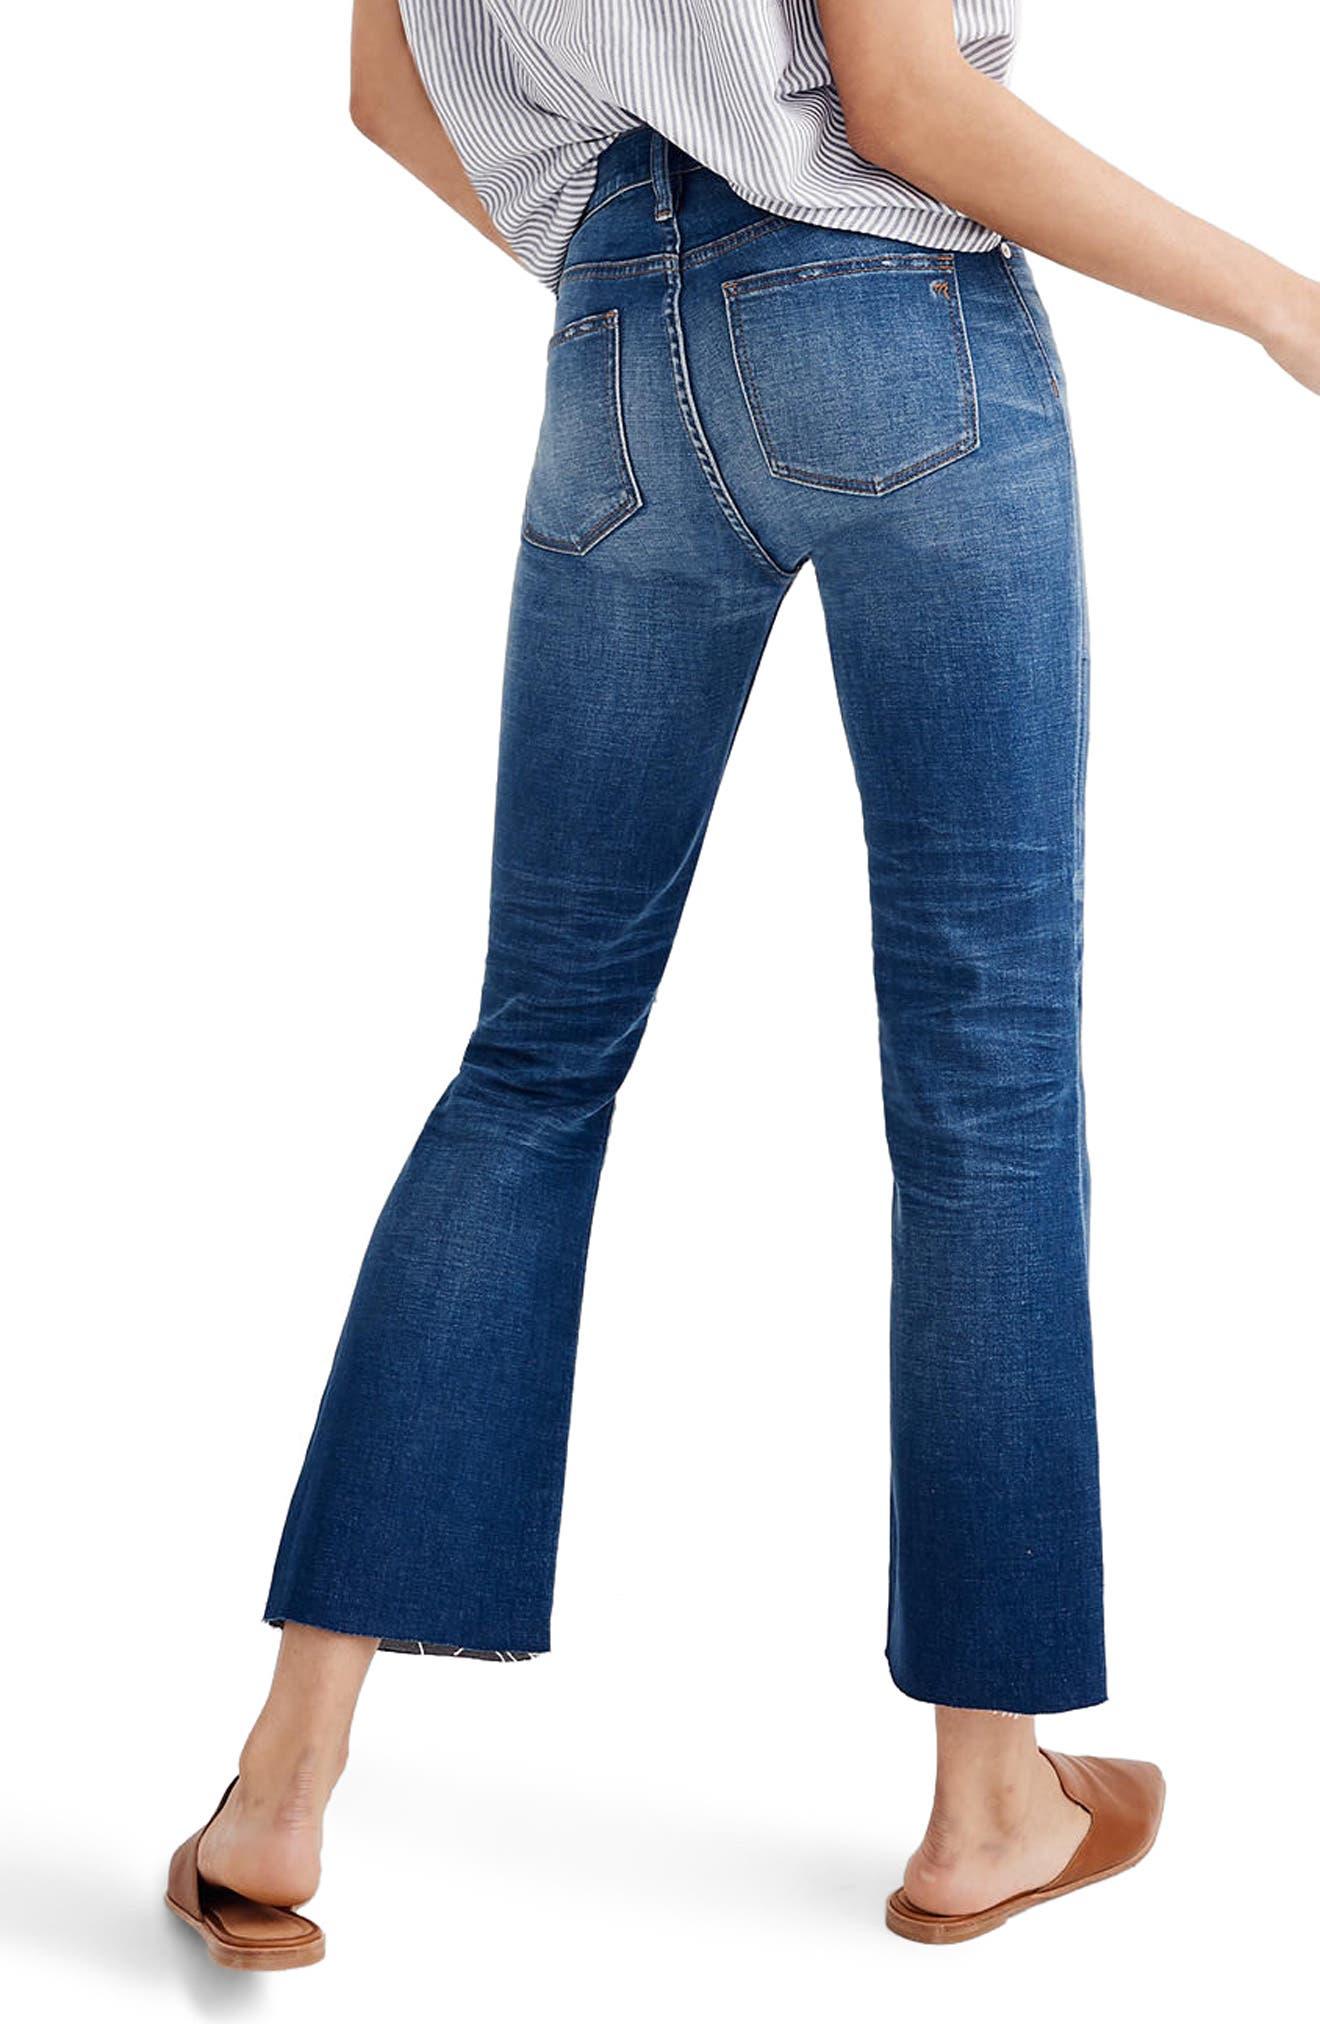 Cali Ripped Demi Bootleg Crop Jeans,                             Alternate thumbnail 2, color,                             Caleb Wash